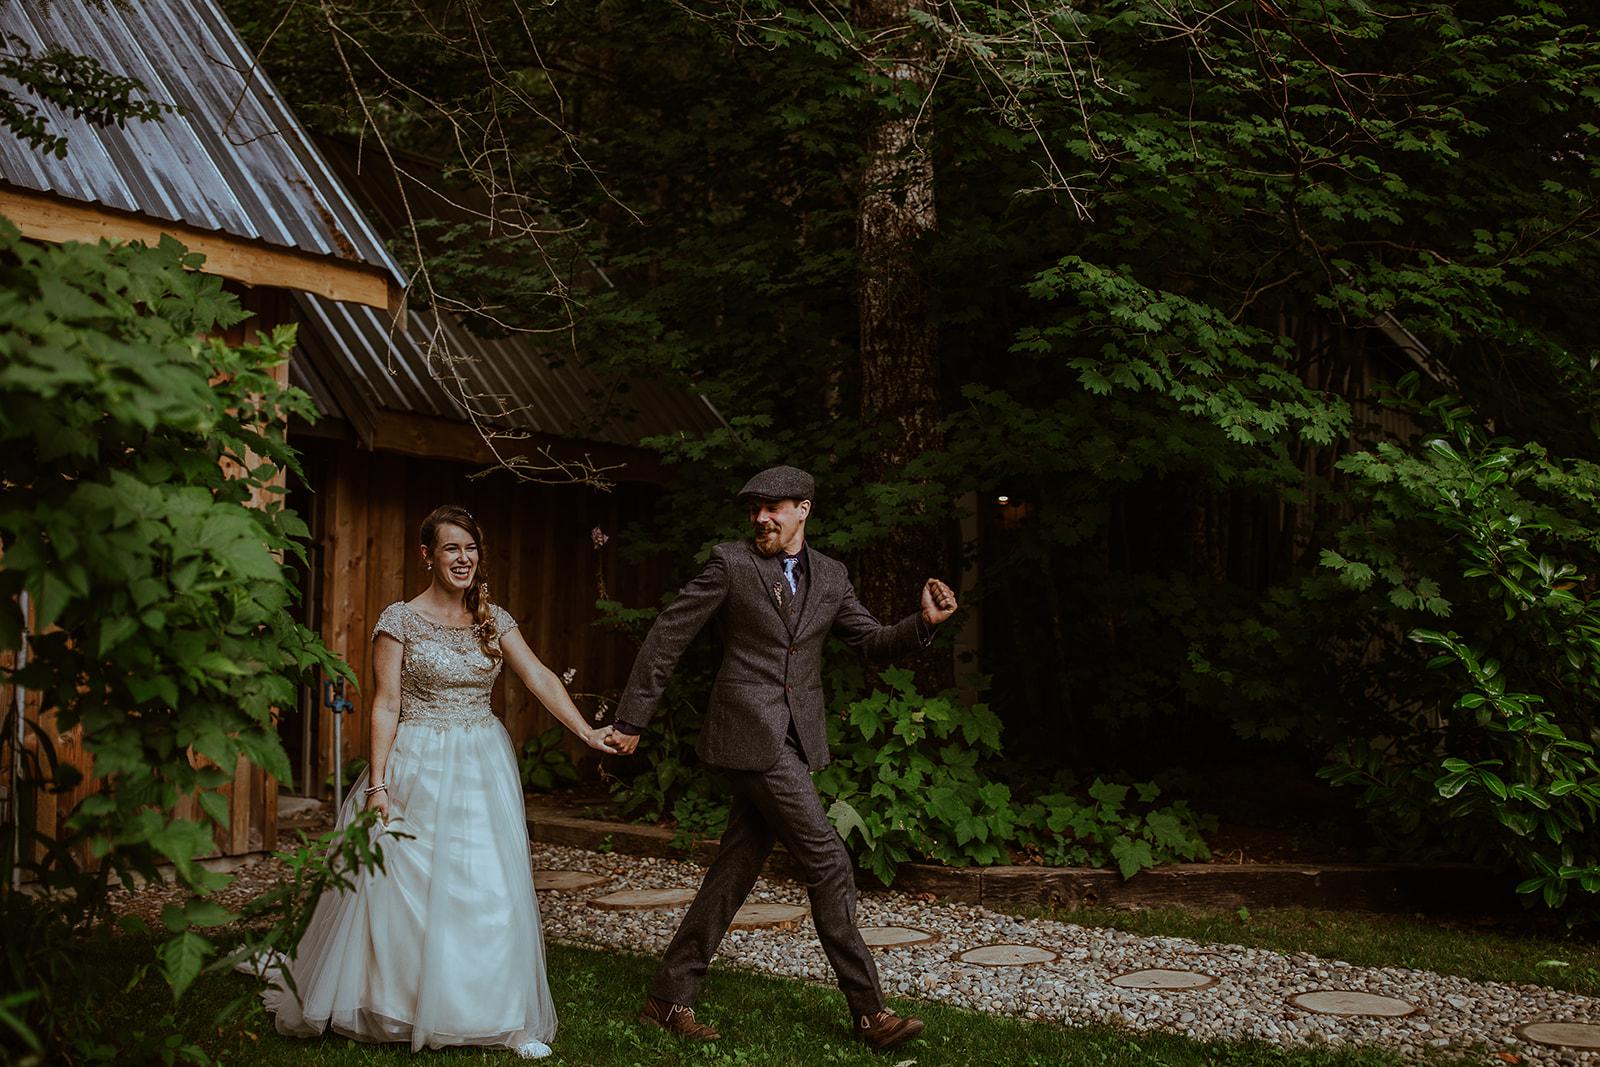 mount-rainier-cabin-elopement-megan-gallagher-photography_(126_of_568).jpg